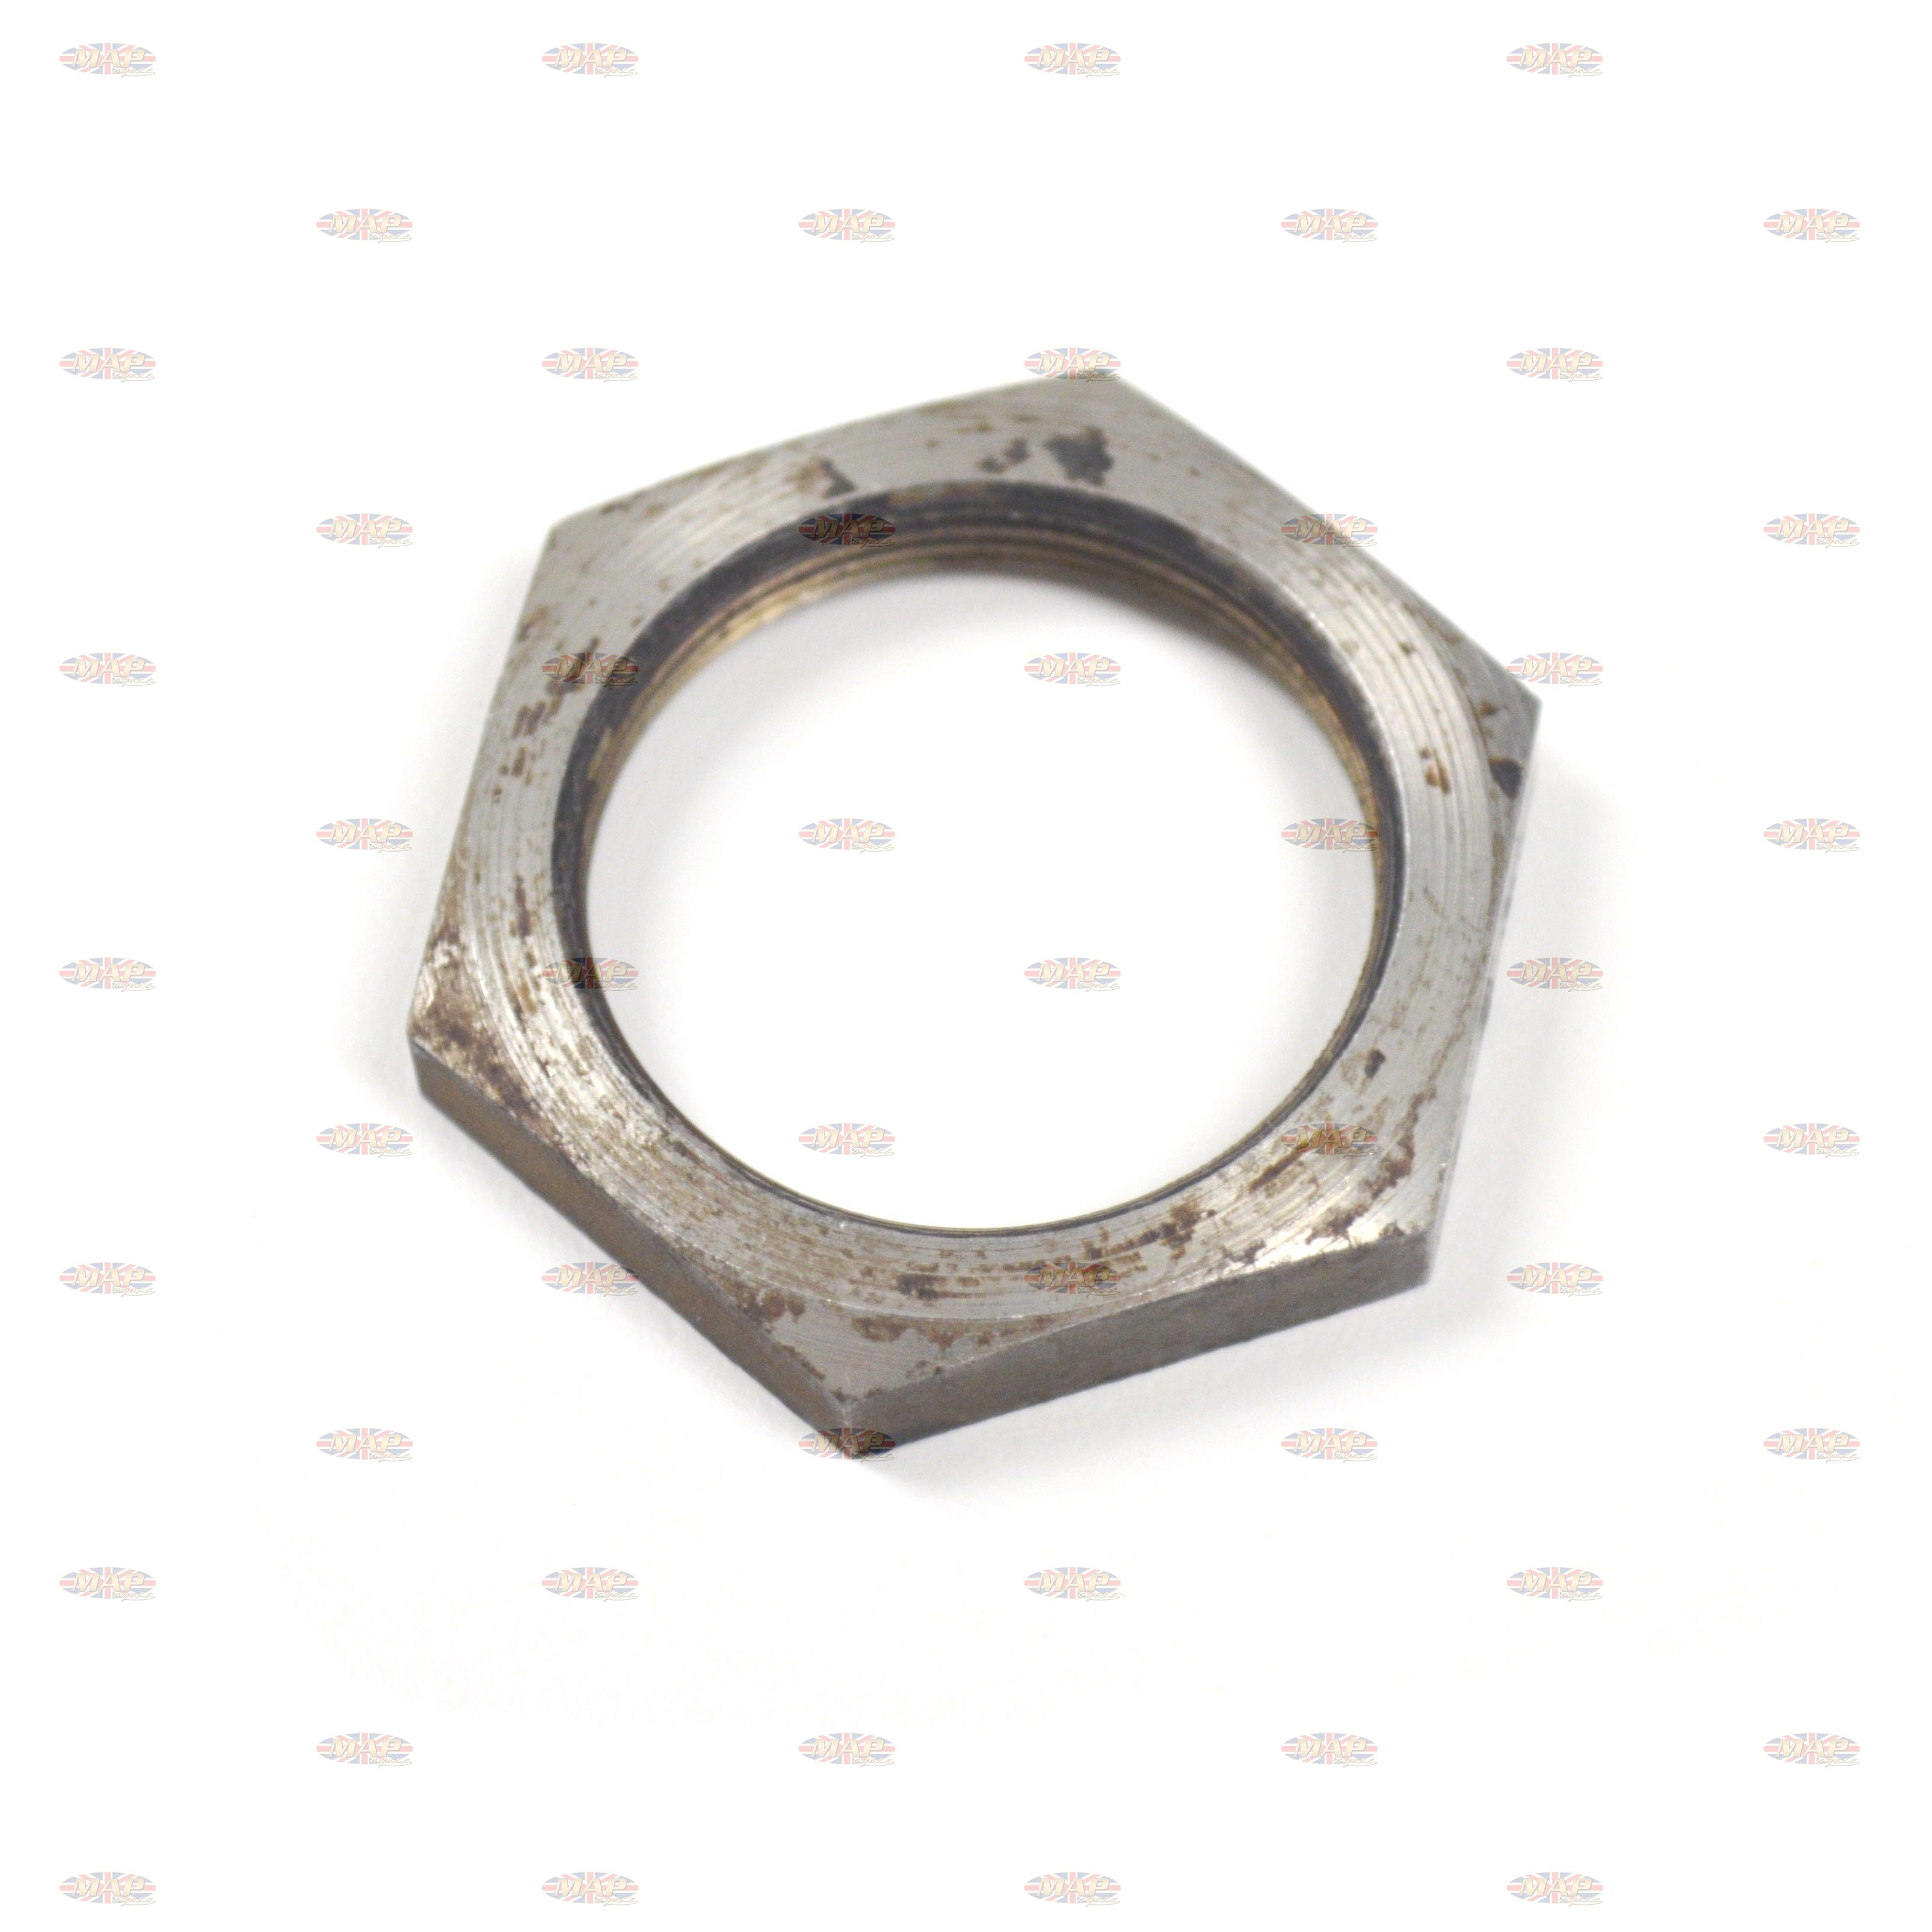 BSA Mainshaft, Countershaft Sprocket Retaining Nut 57-1434